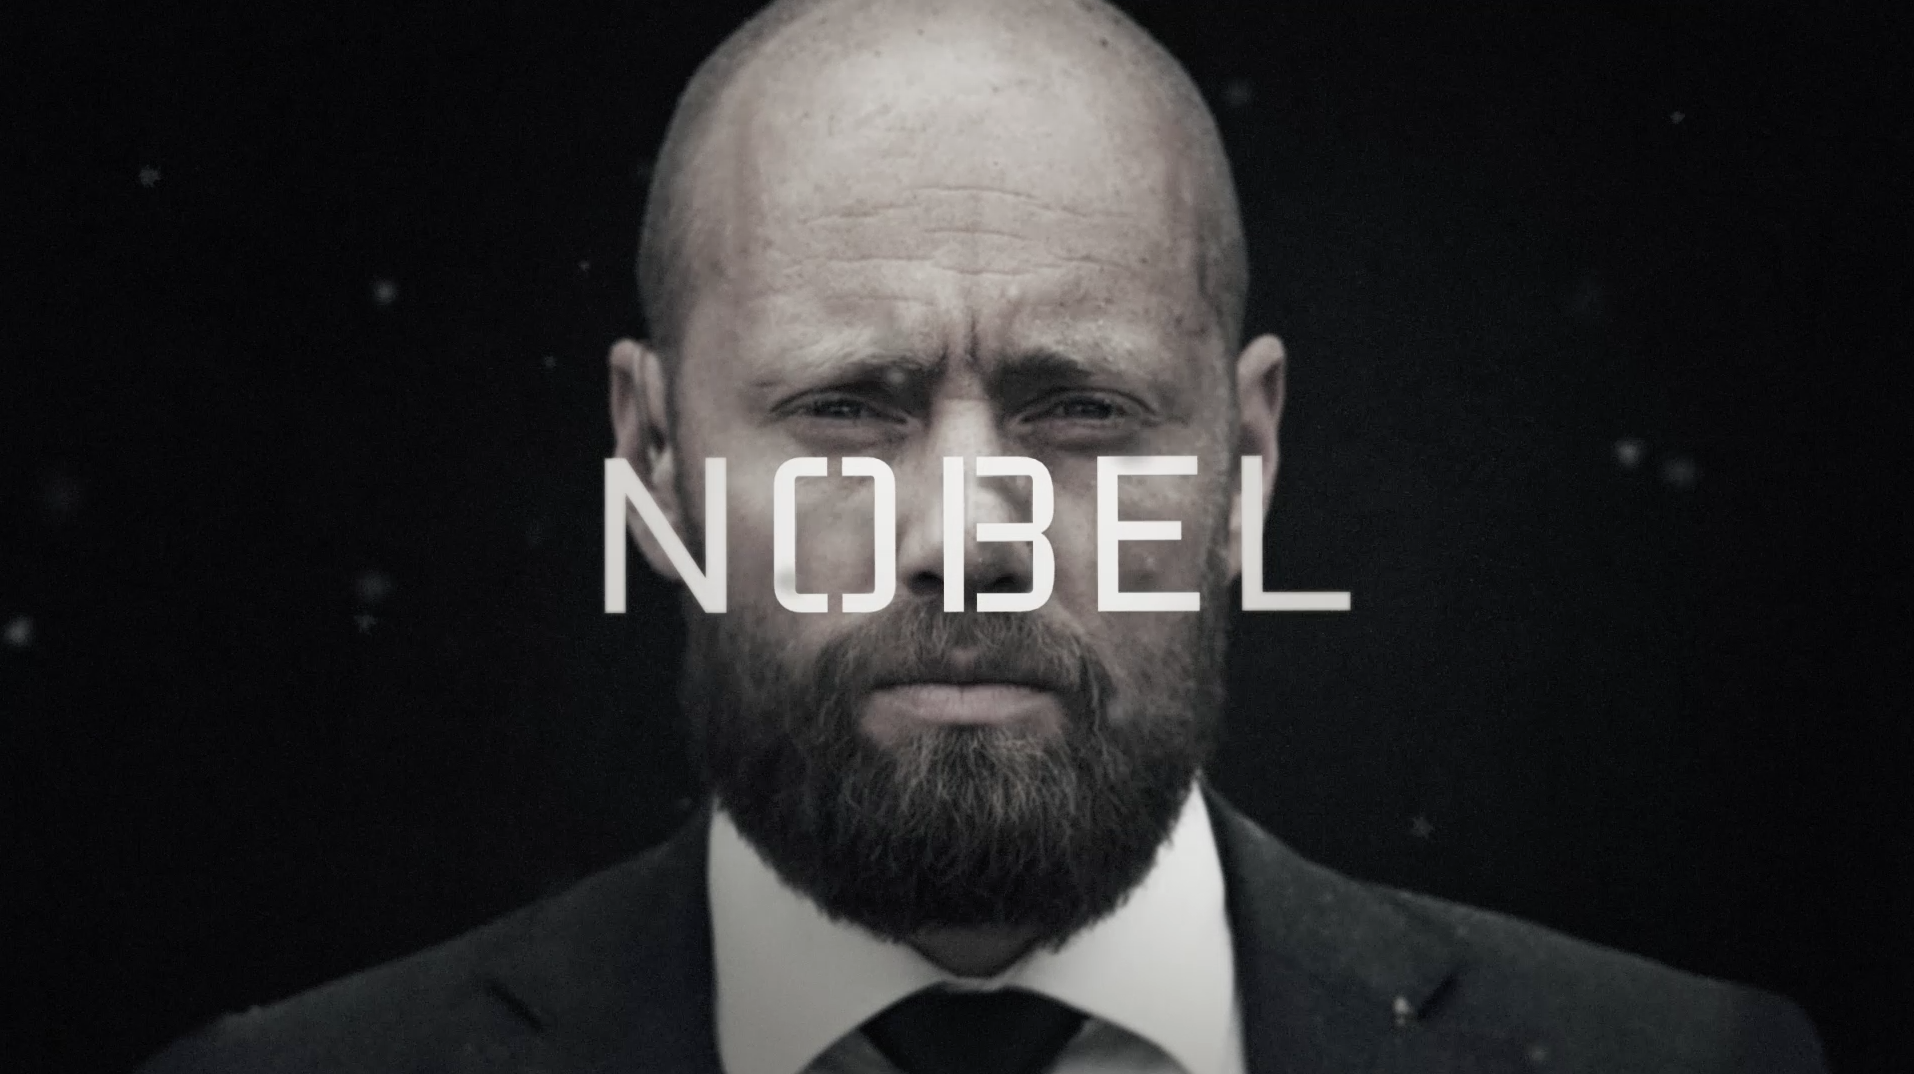 Nobel_Provinsen_Title_Sequence_02